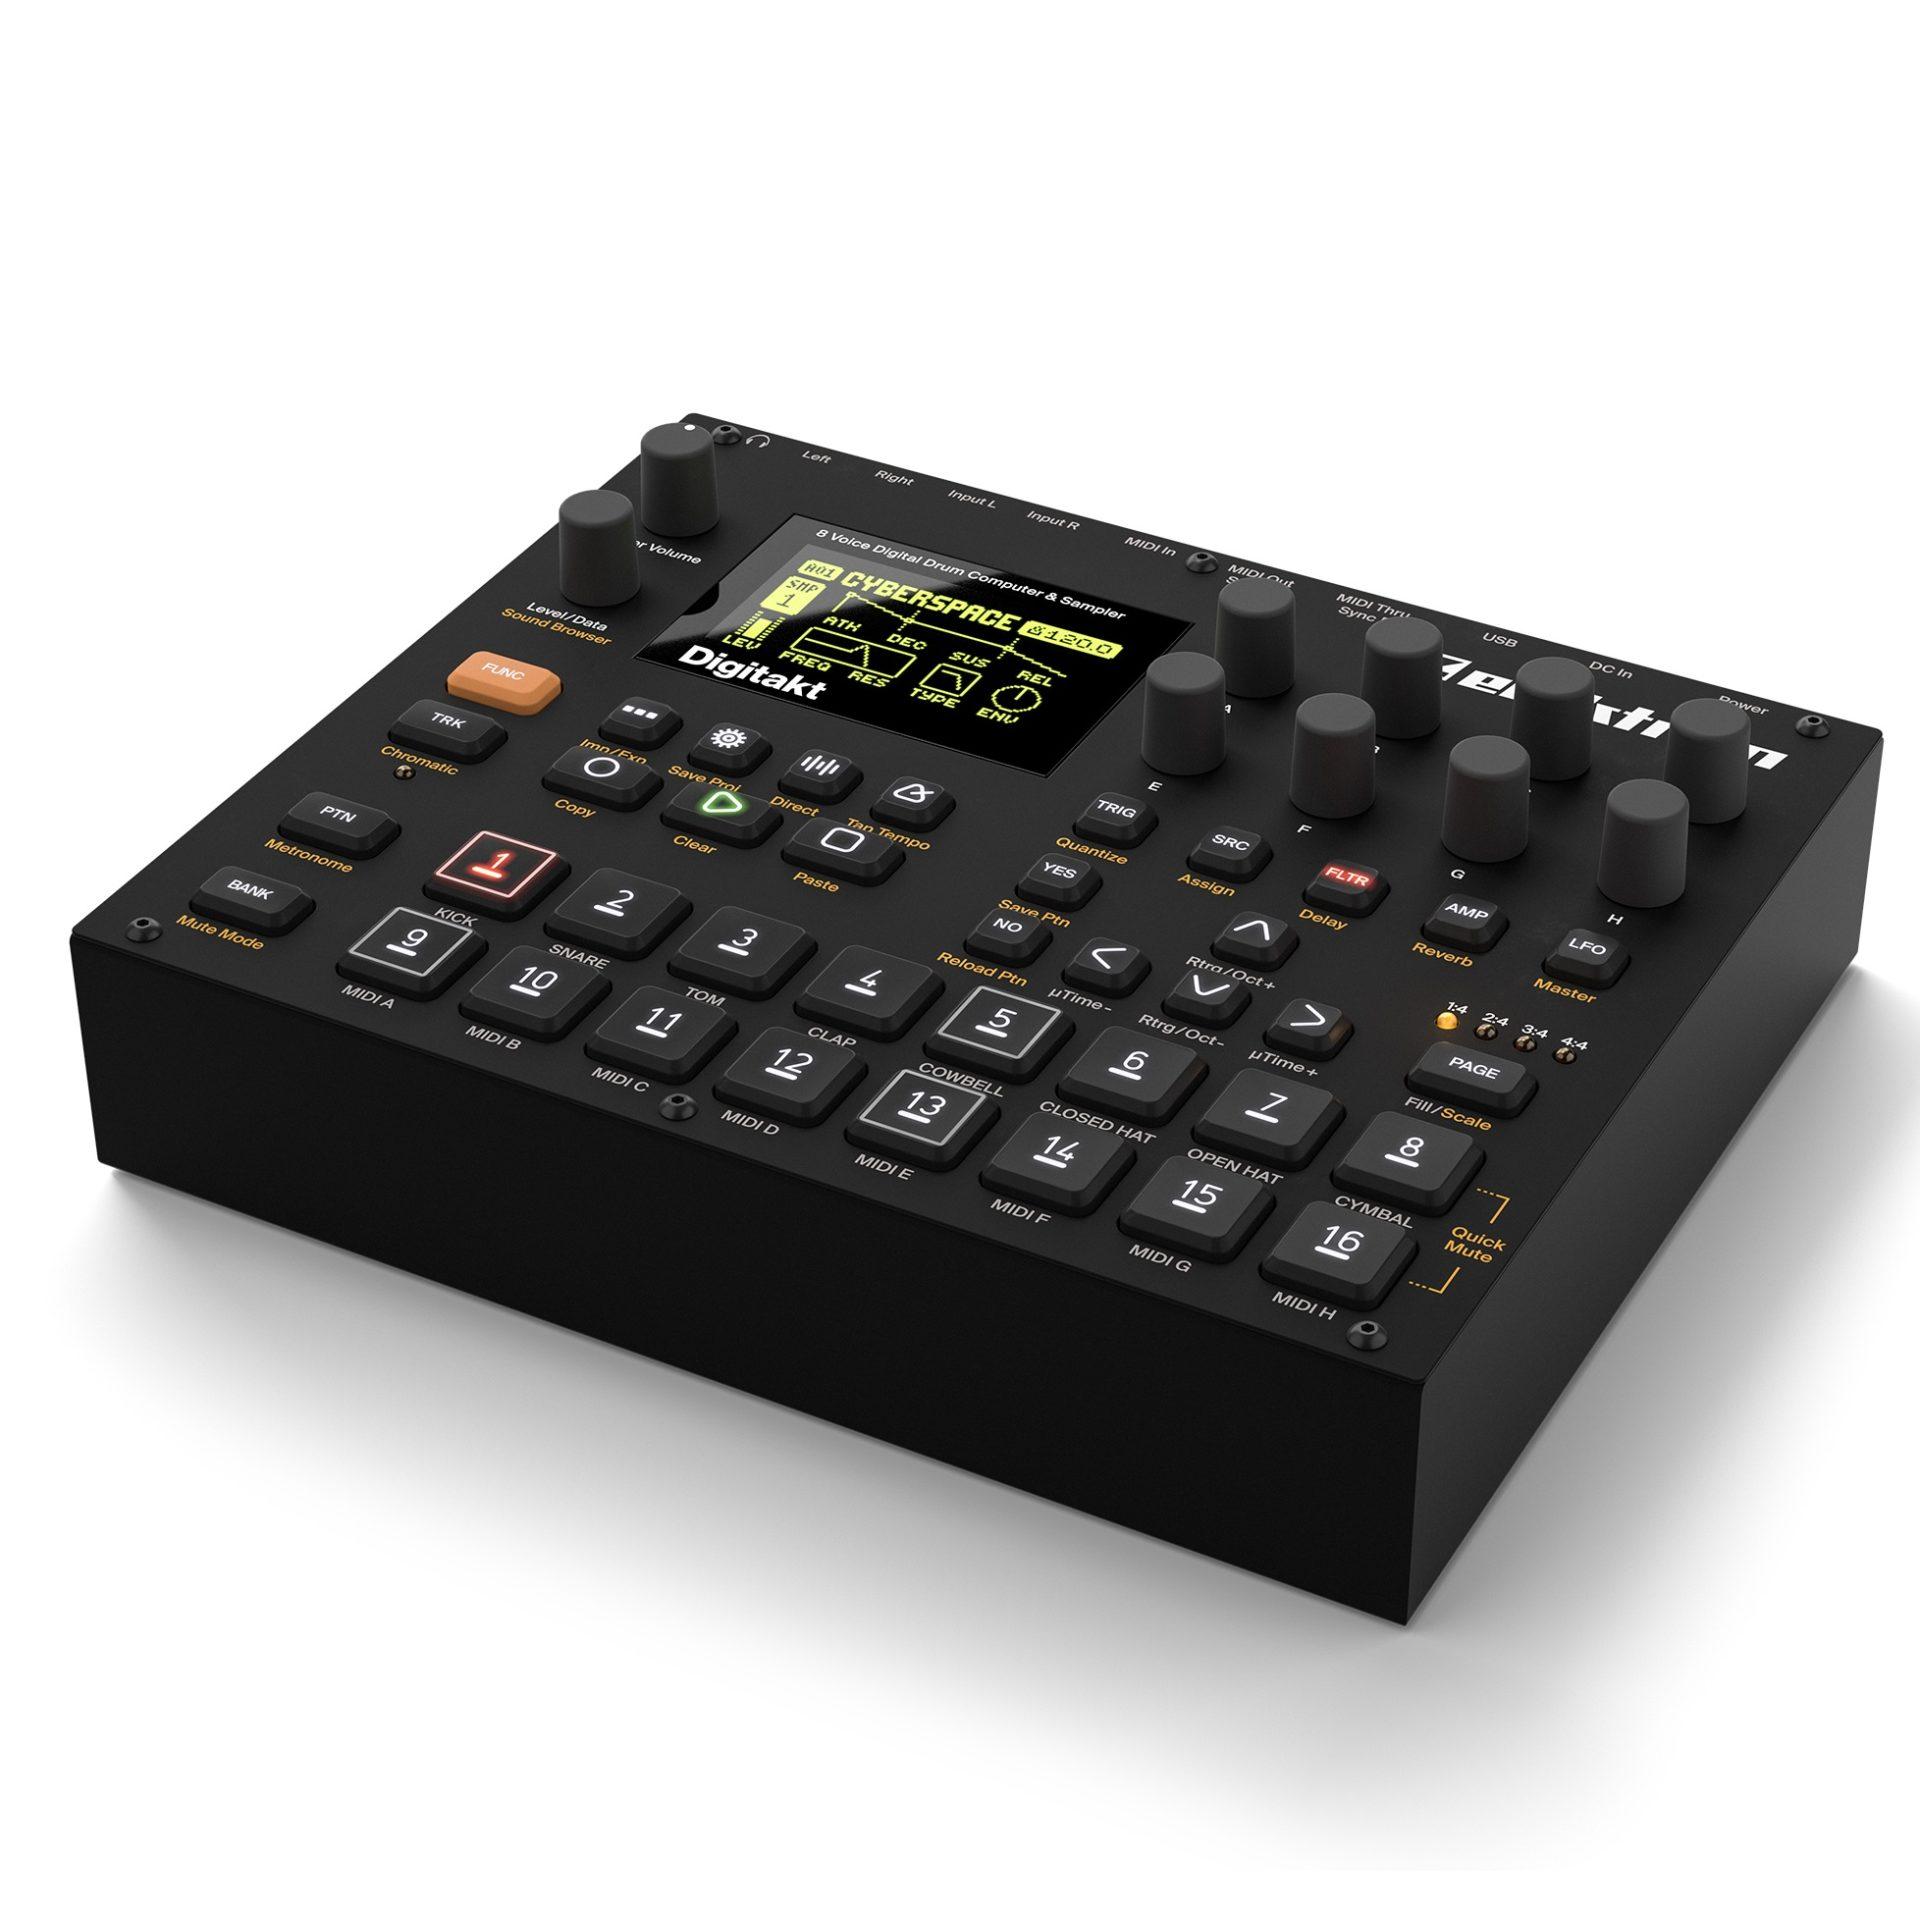 Batería Digital y Sampler Elektron Digitakt 8-Voice 1